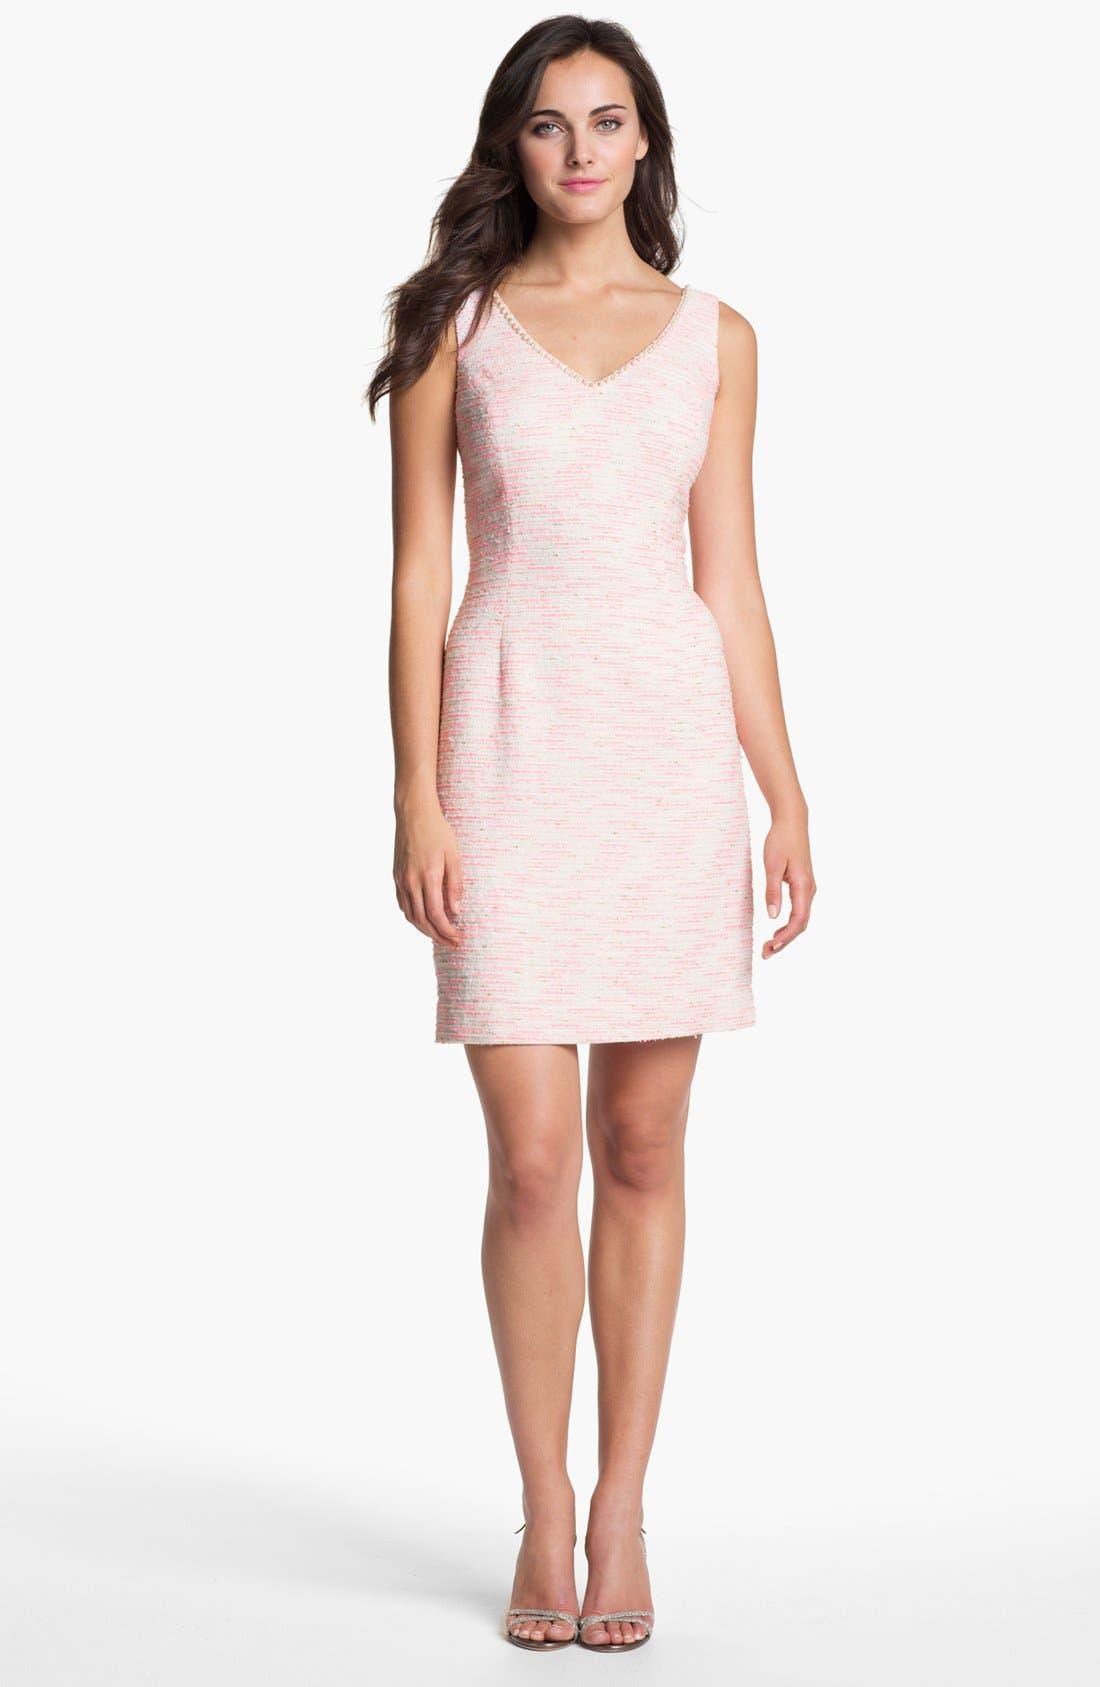 Alternate Image 1 Selected - Lilly Pulitzer® 'Laidley' Embellished Sheath Dress